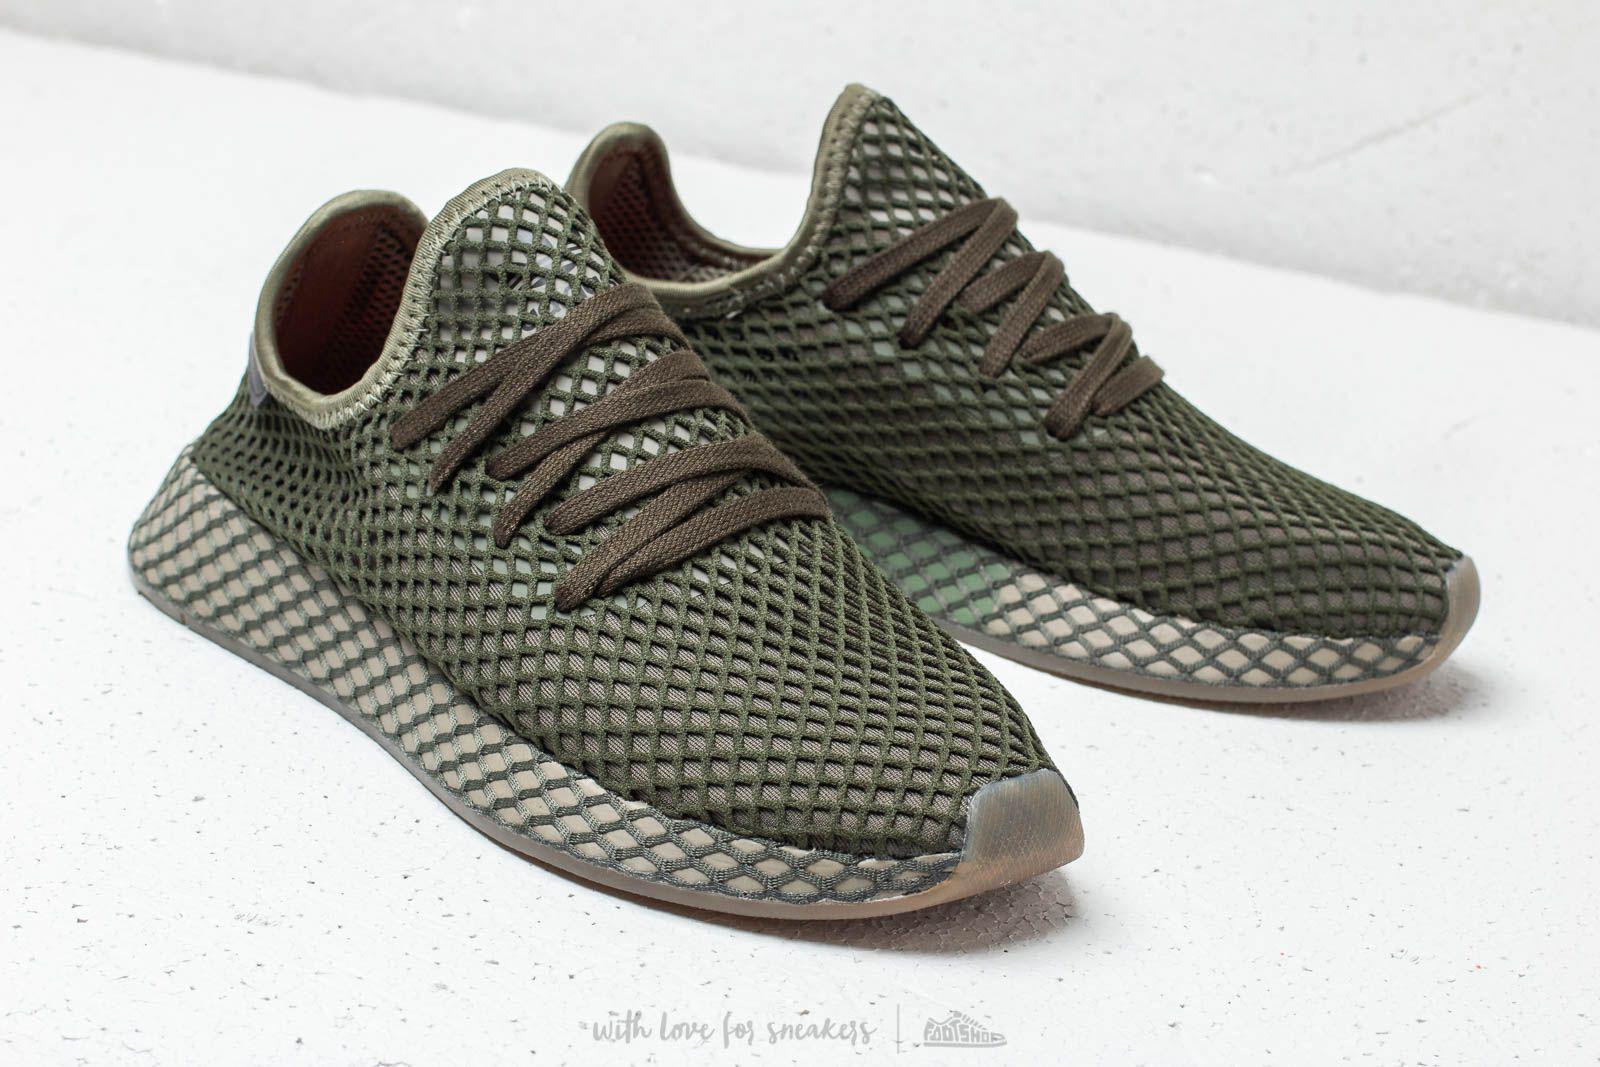 9a82babafde59 Lyst - adidas Originals Adidas Deerupt Runner Base Green  Base Green ...